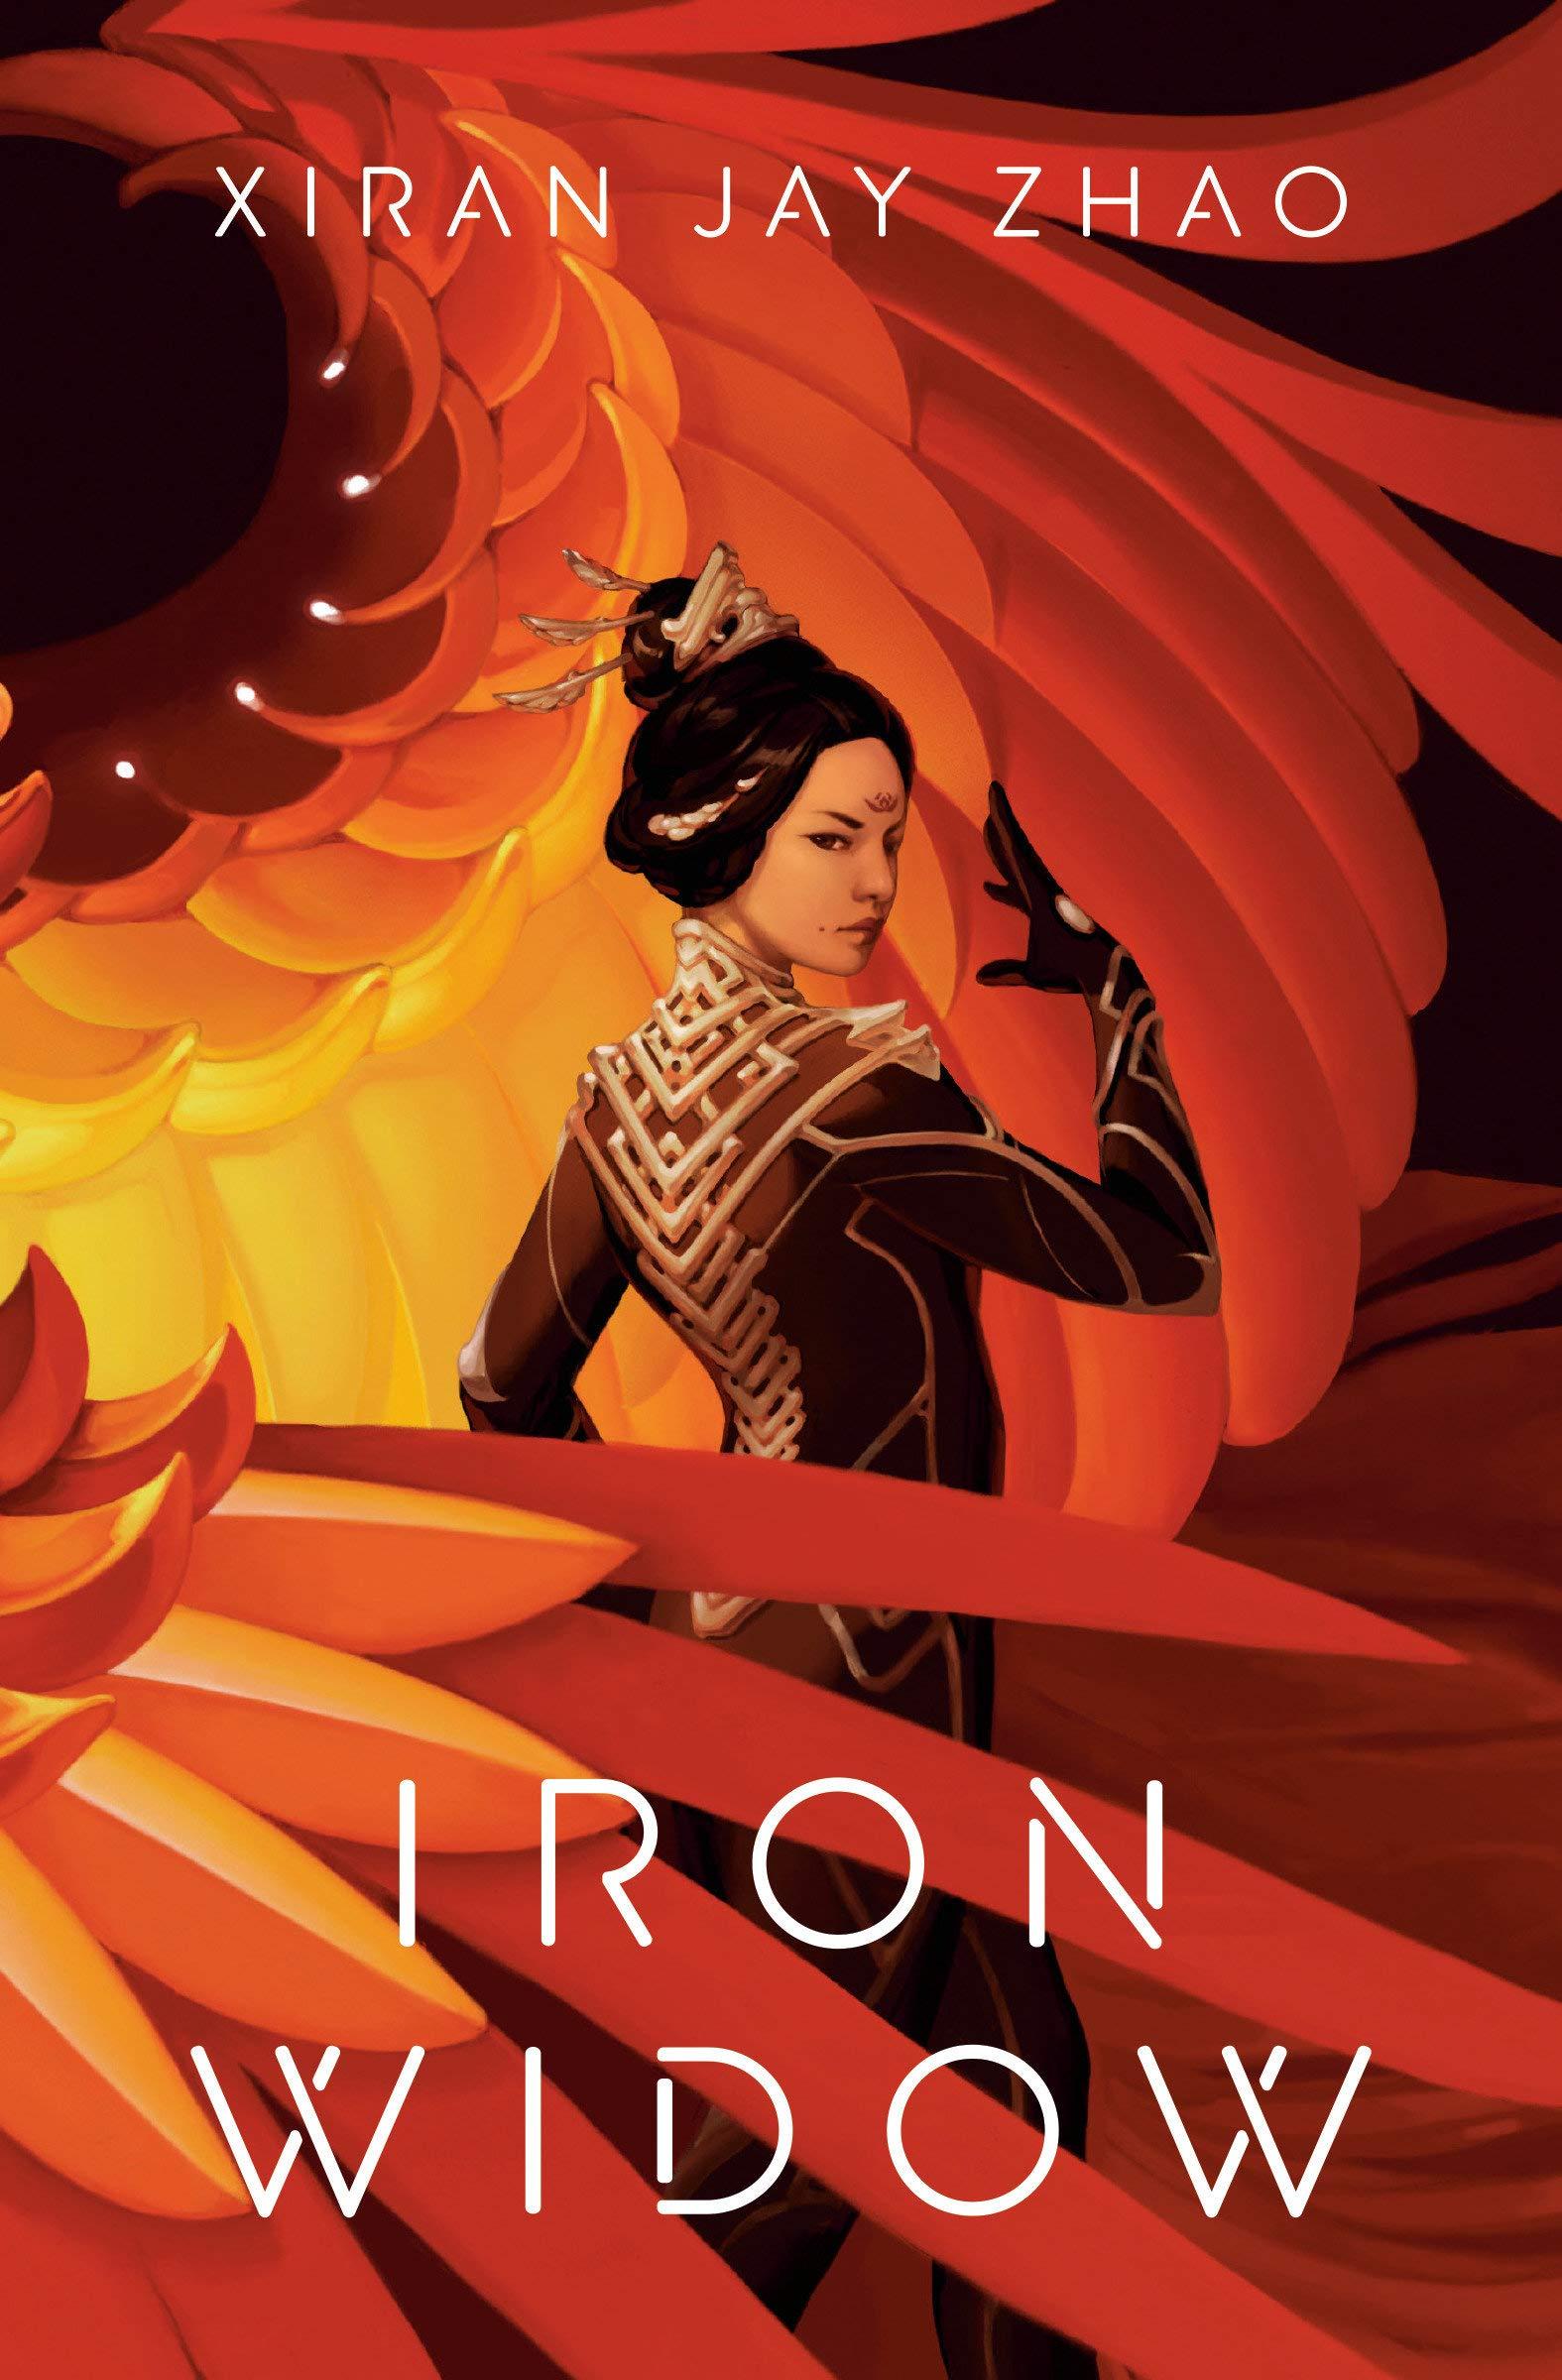 Amazon.com: Iron Widow: 9780735269934: Zhao, Xiran Jay: Books